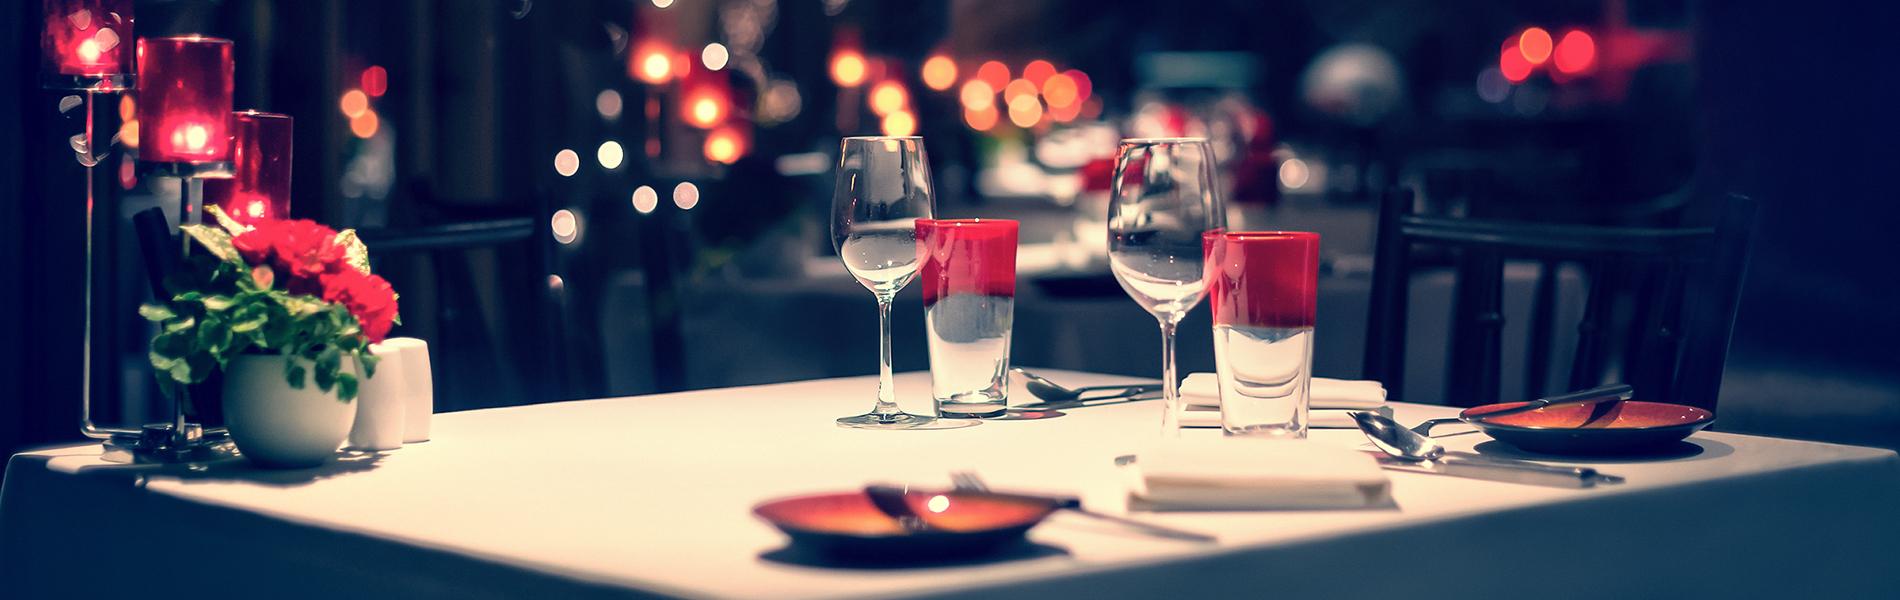 Restaurant / Bar / Hospitality